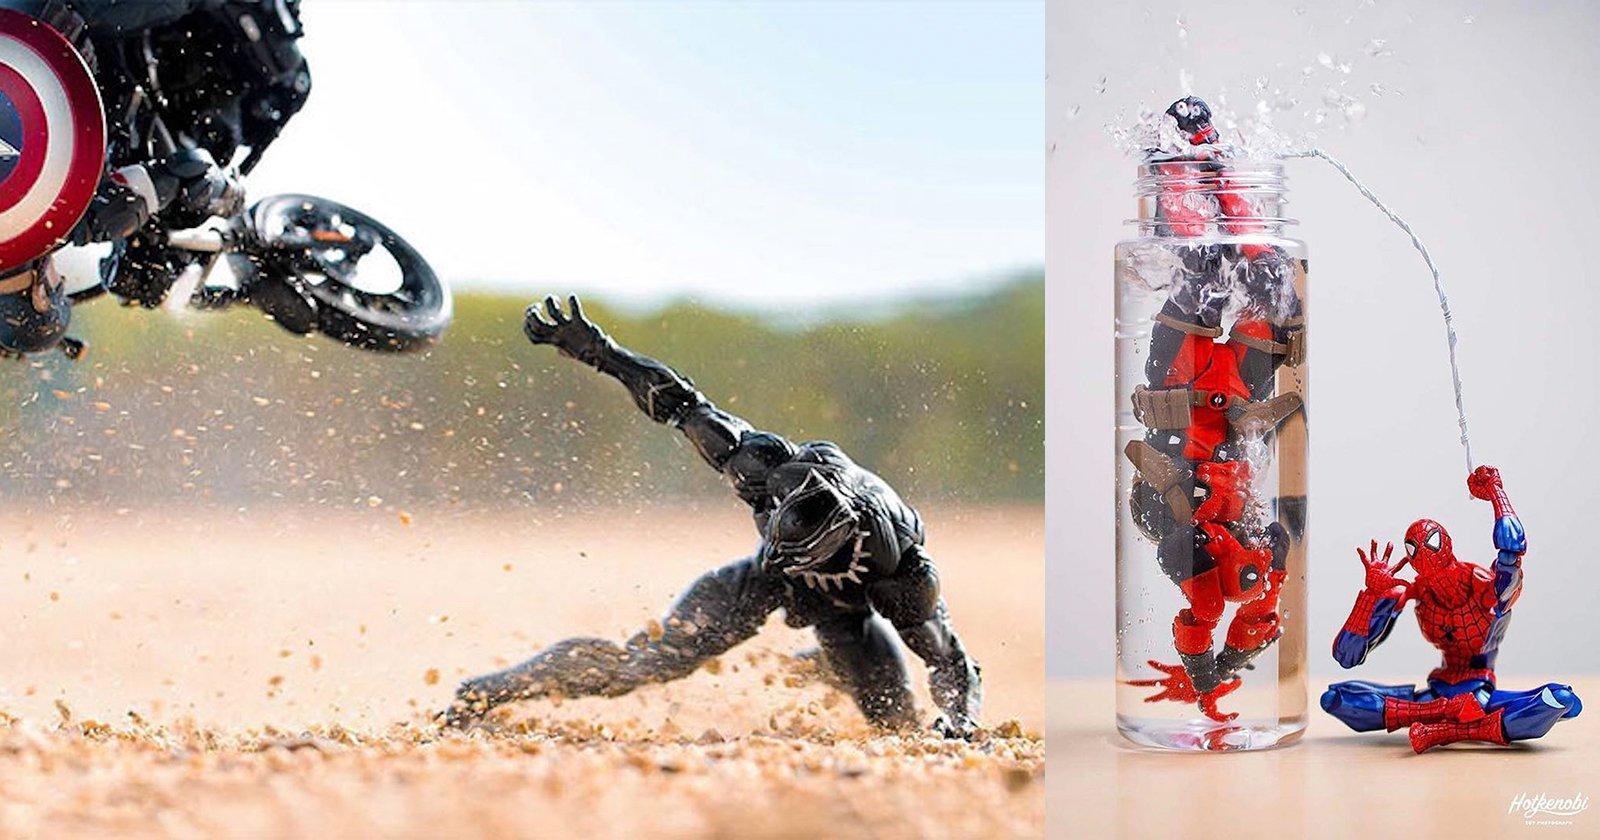 Creative Photographer Brings Action Figures to Life in Fun ... Panda 500